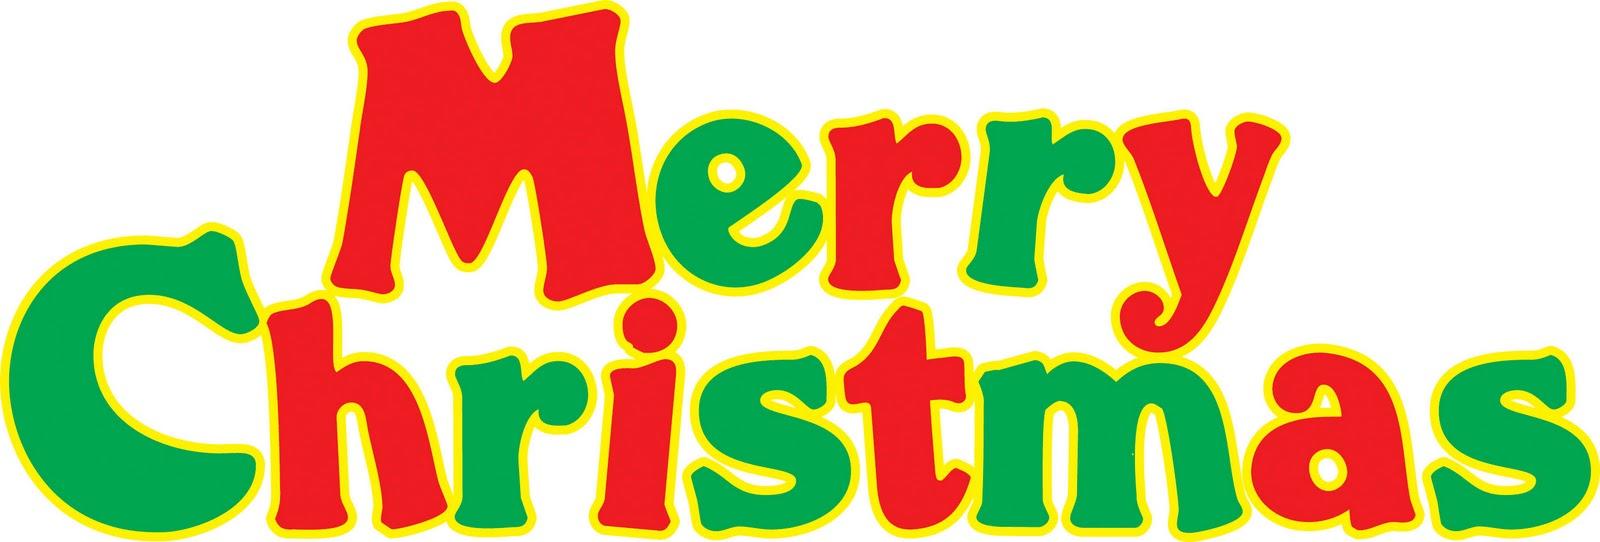 1600x542 Free Vintage Merry Christmas Clip Art